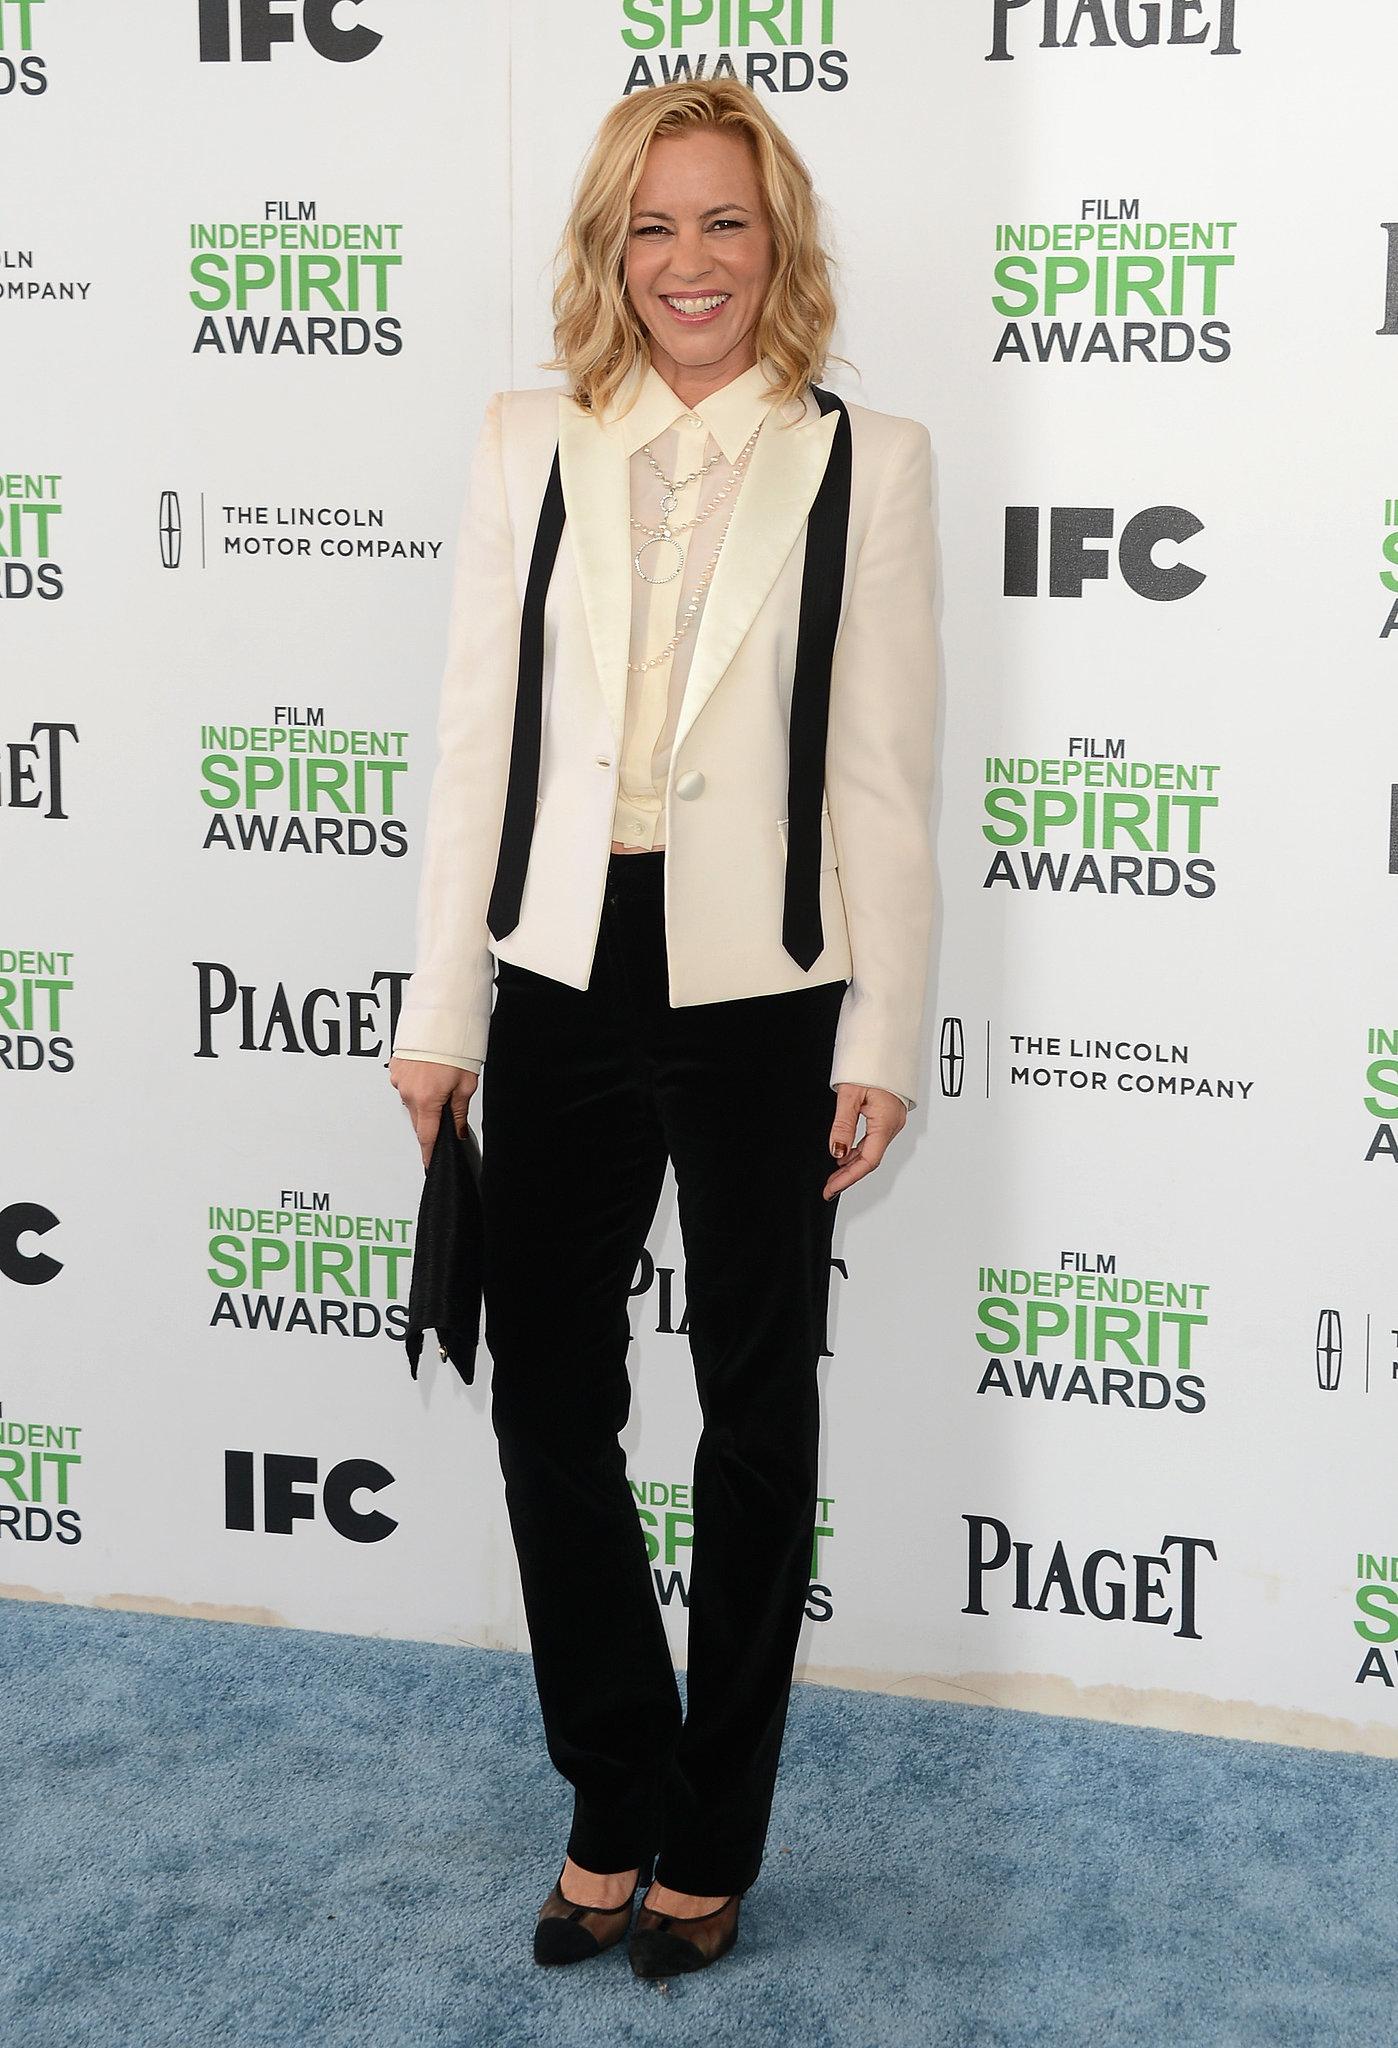 Maria Bello at the 2014 Spirit Awards